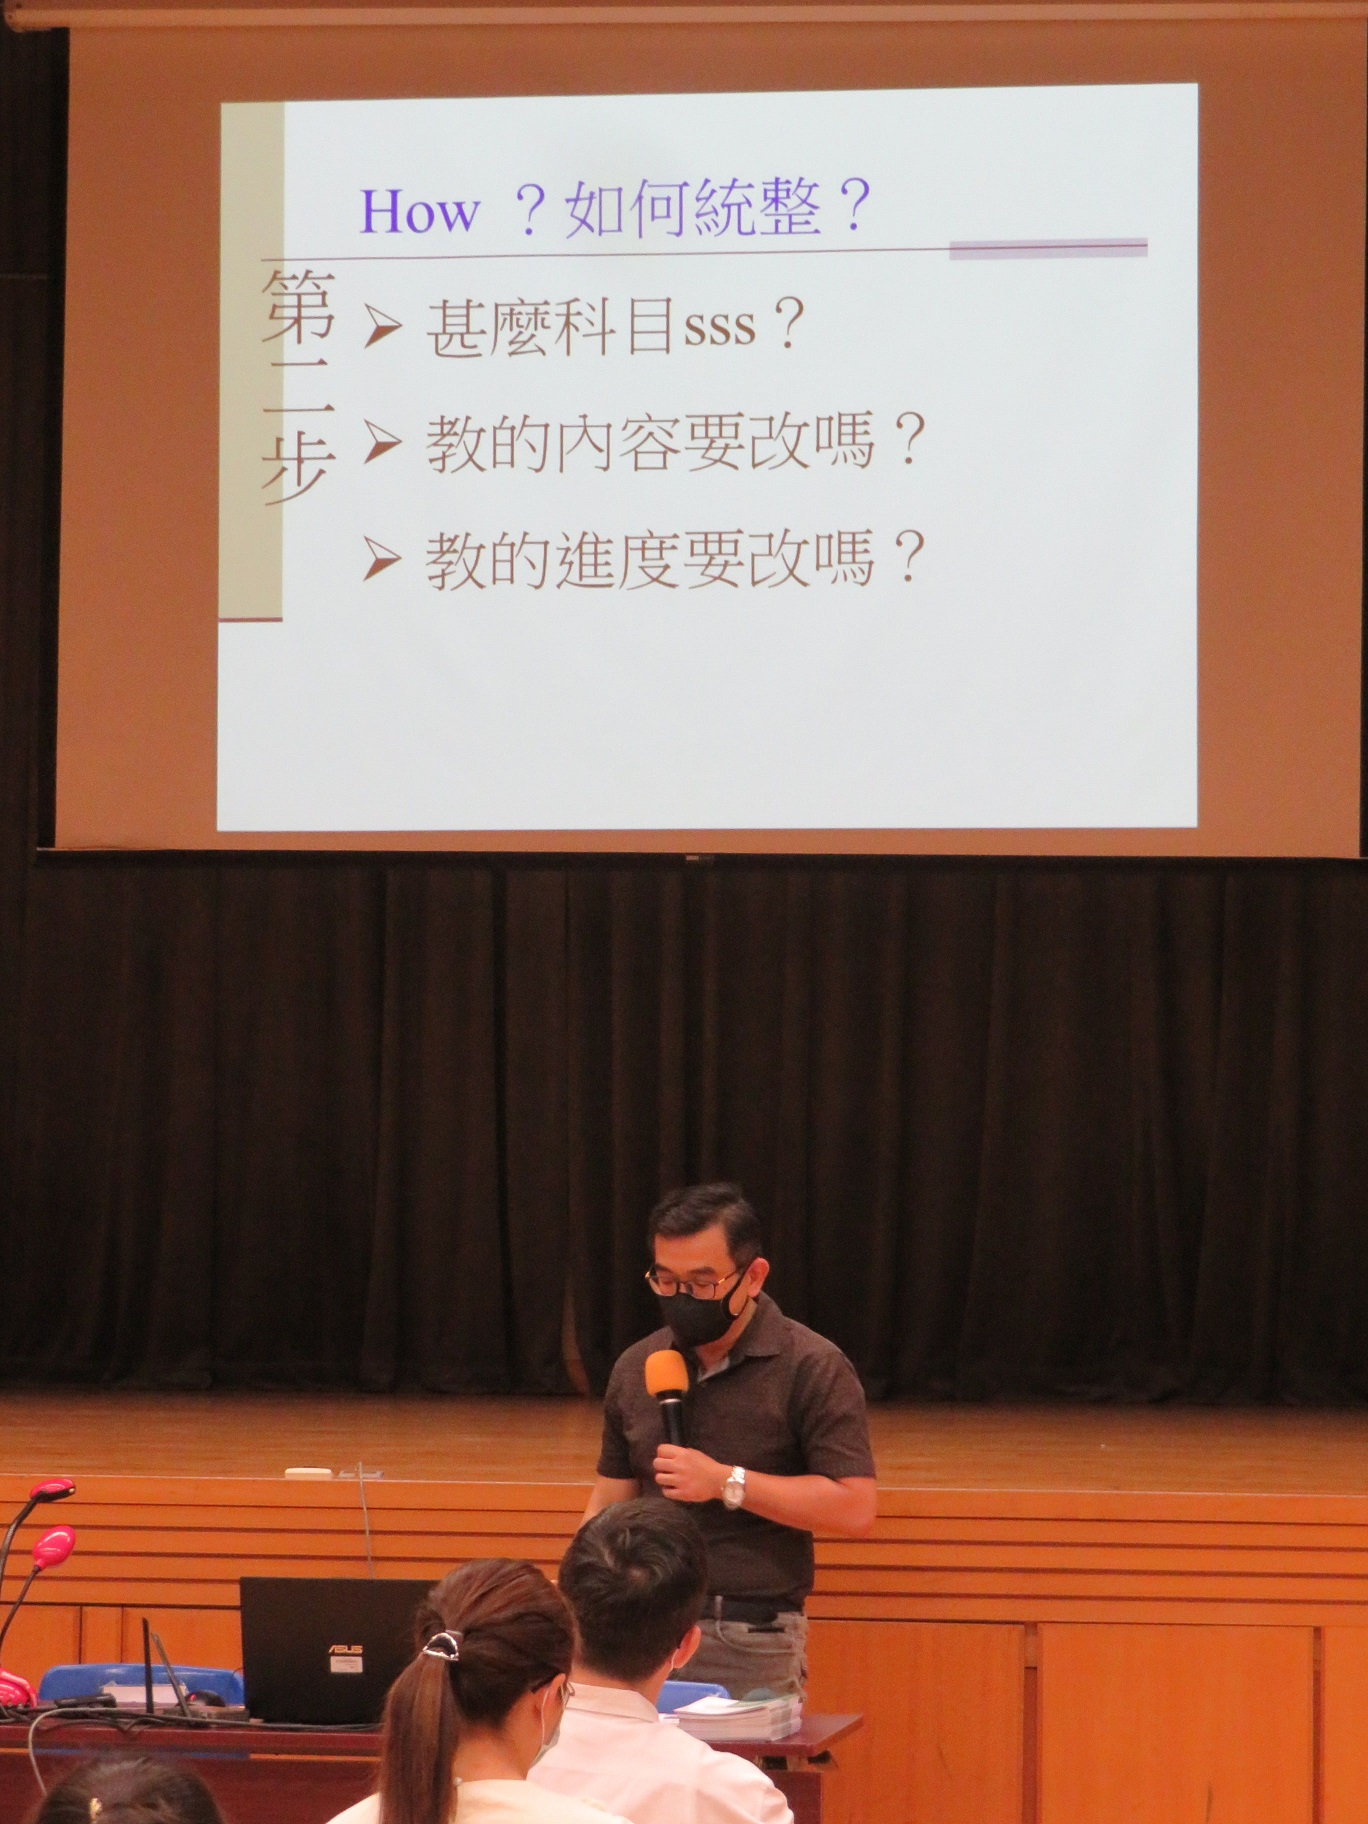 https://syh.edu.hk/sites/default/files/img_0466_1.jpg